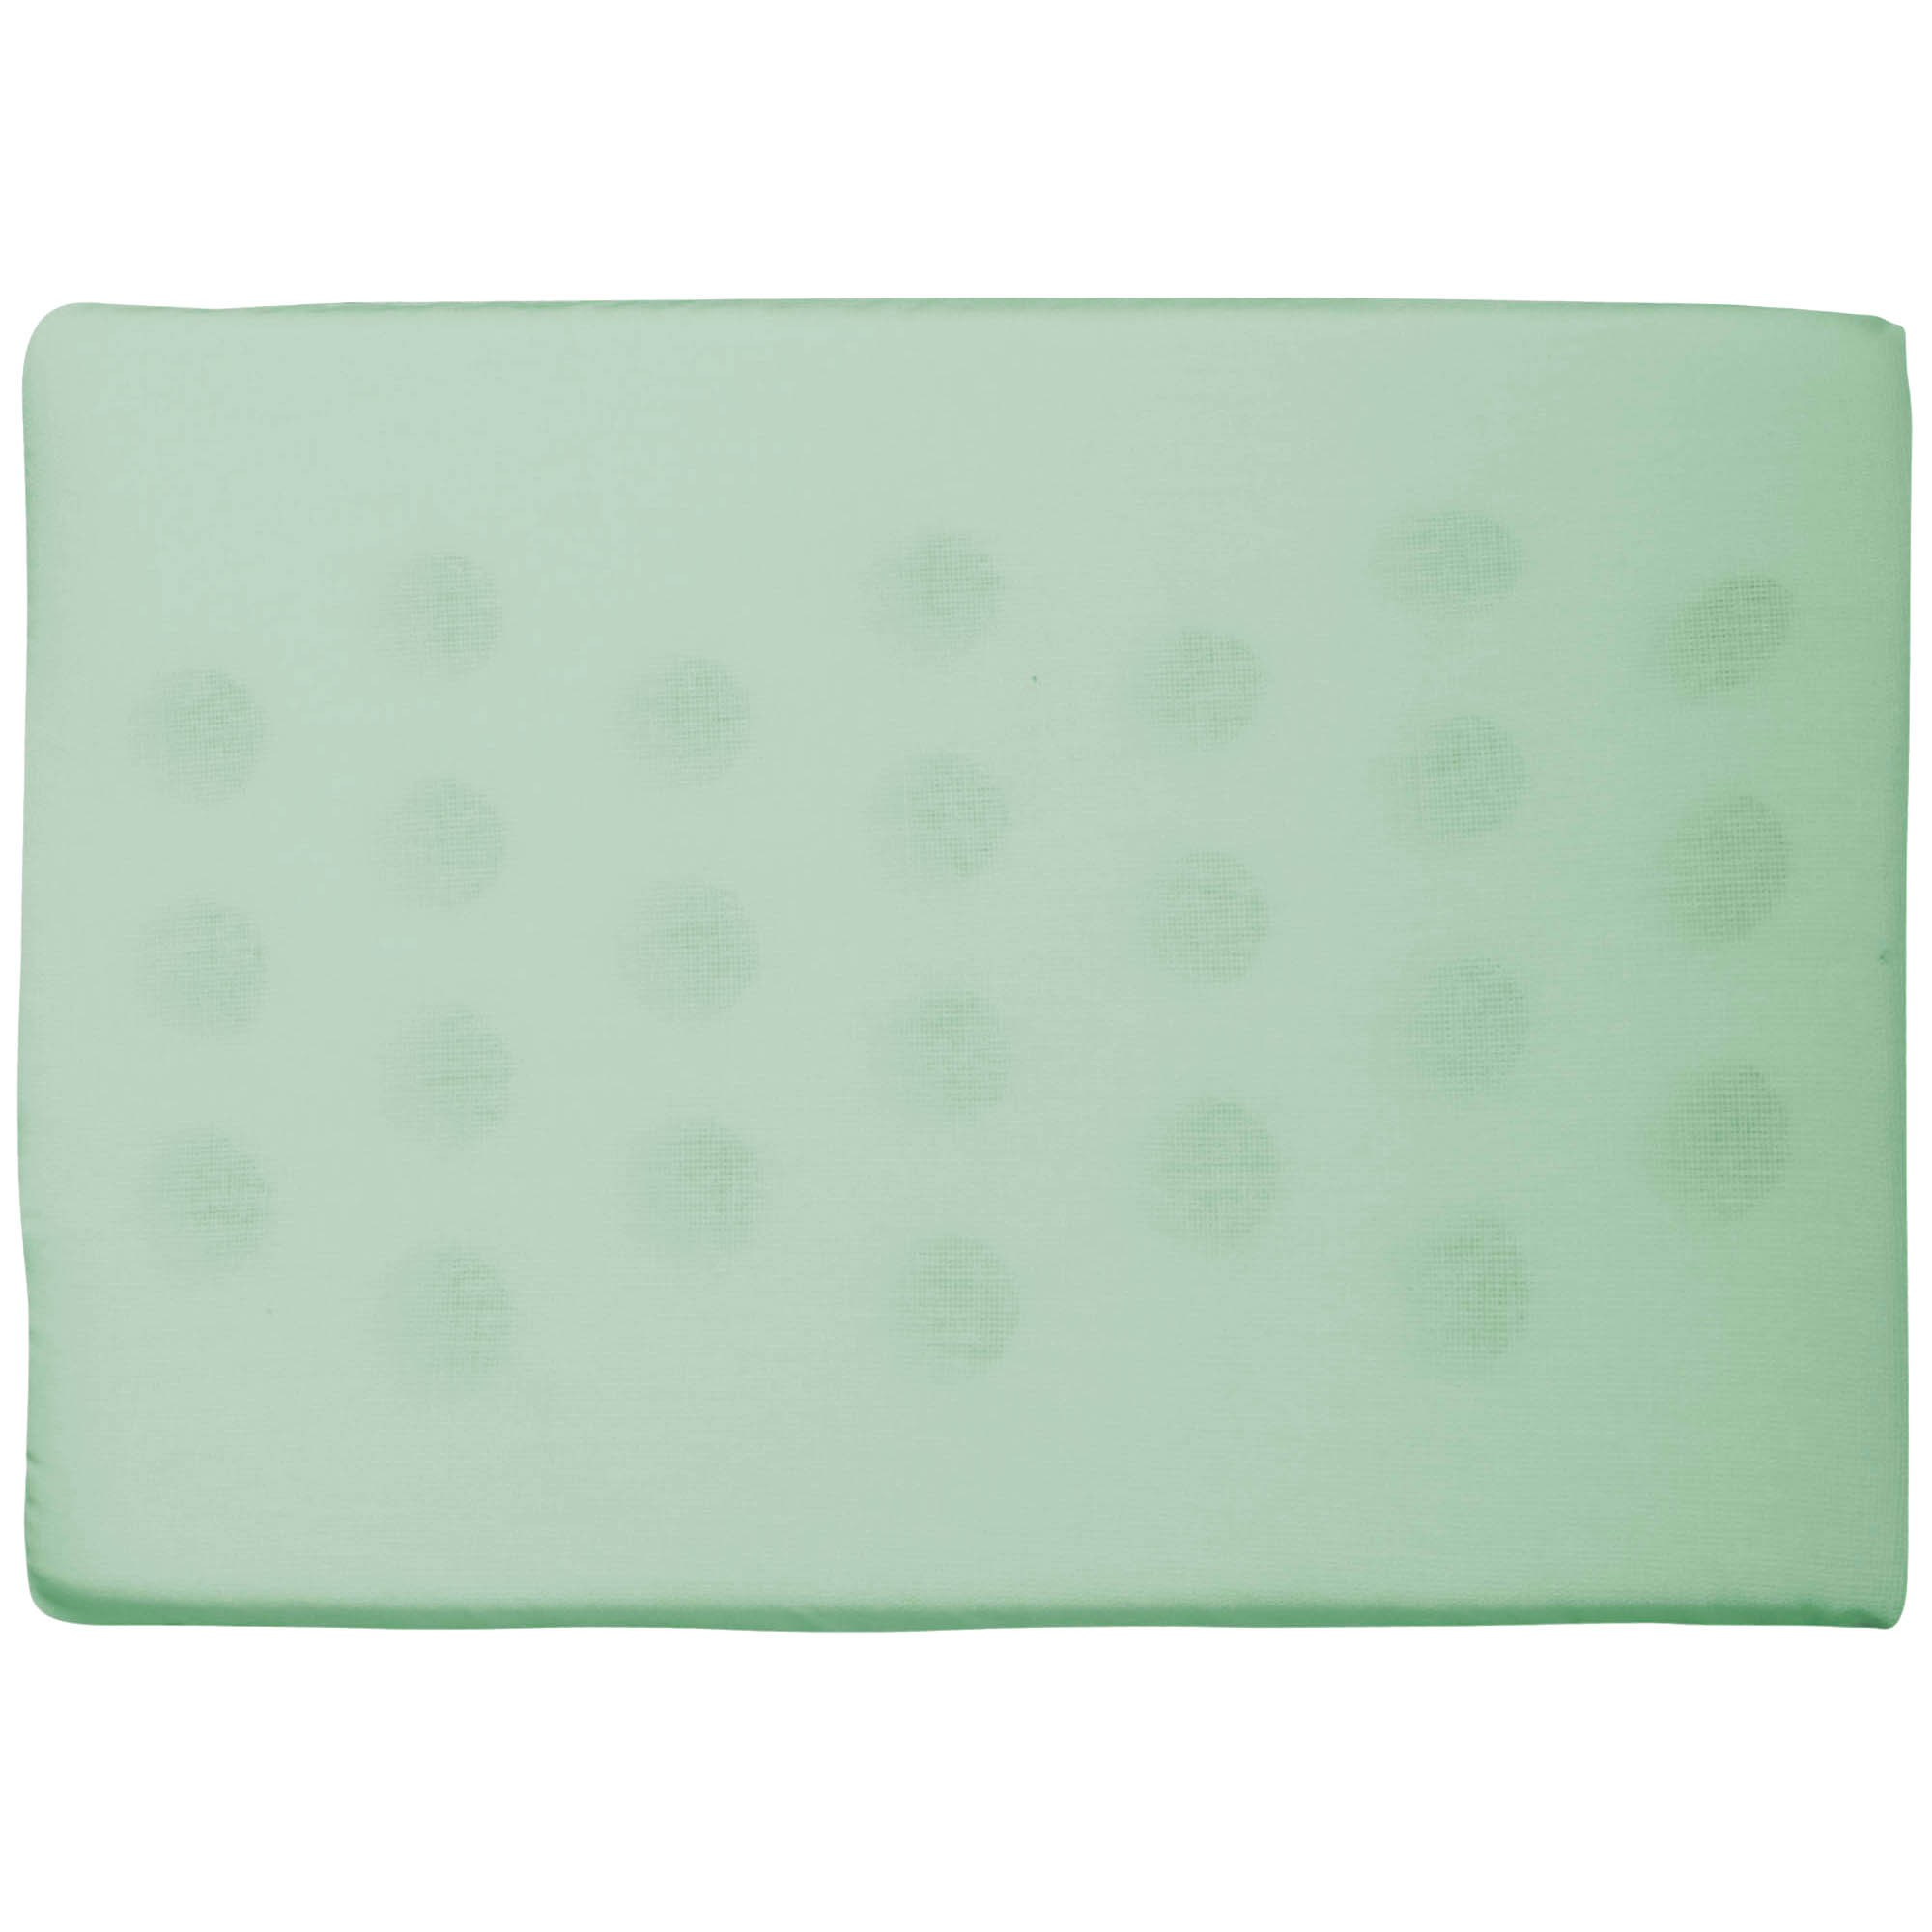 Travesseiro Antissufocante Liso - Incomfral - Bambi - Verde